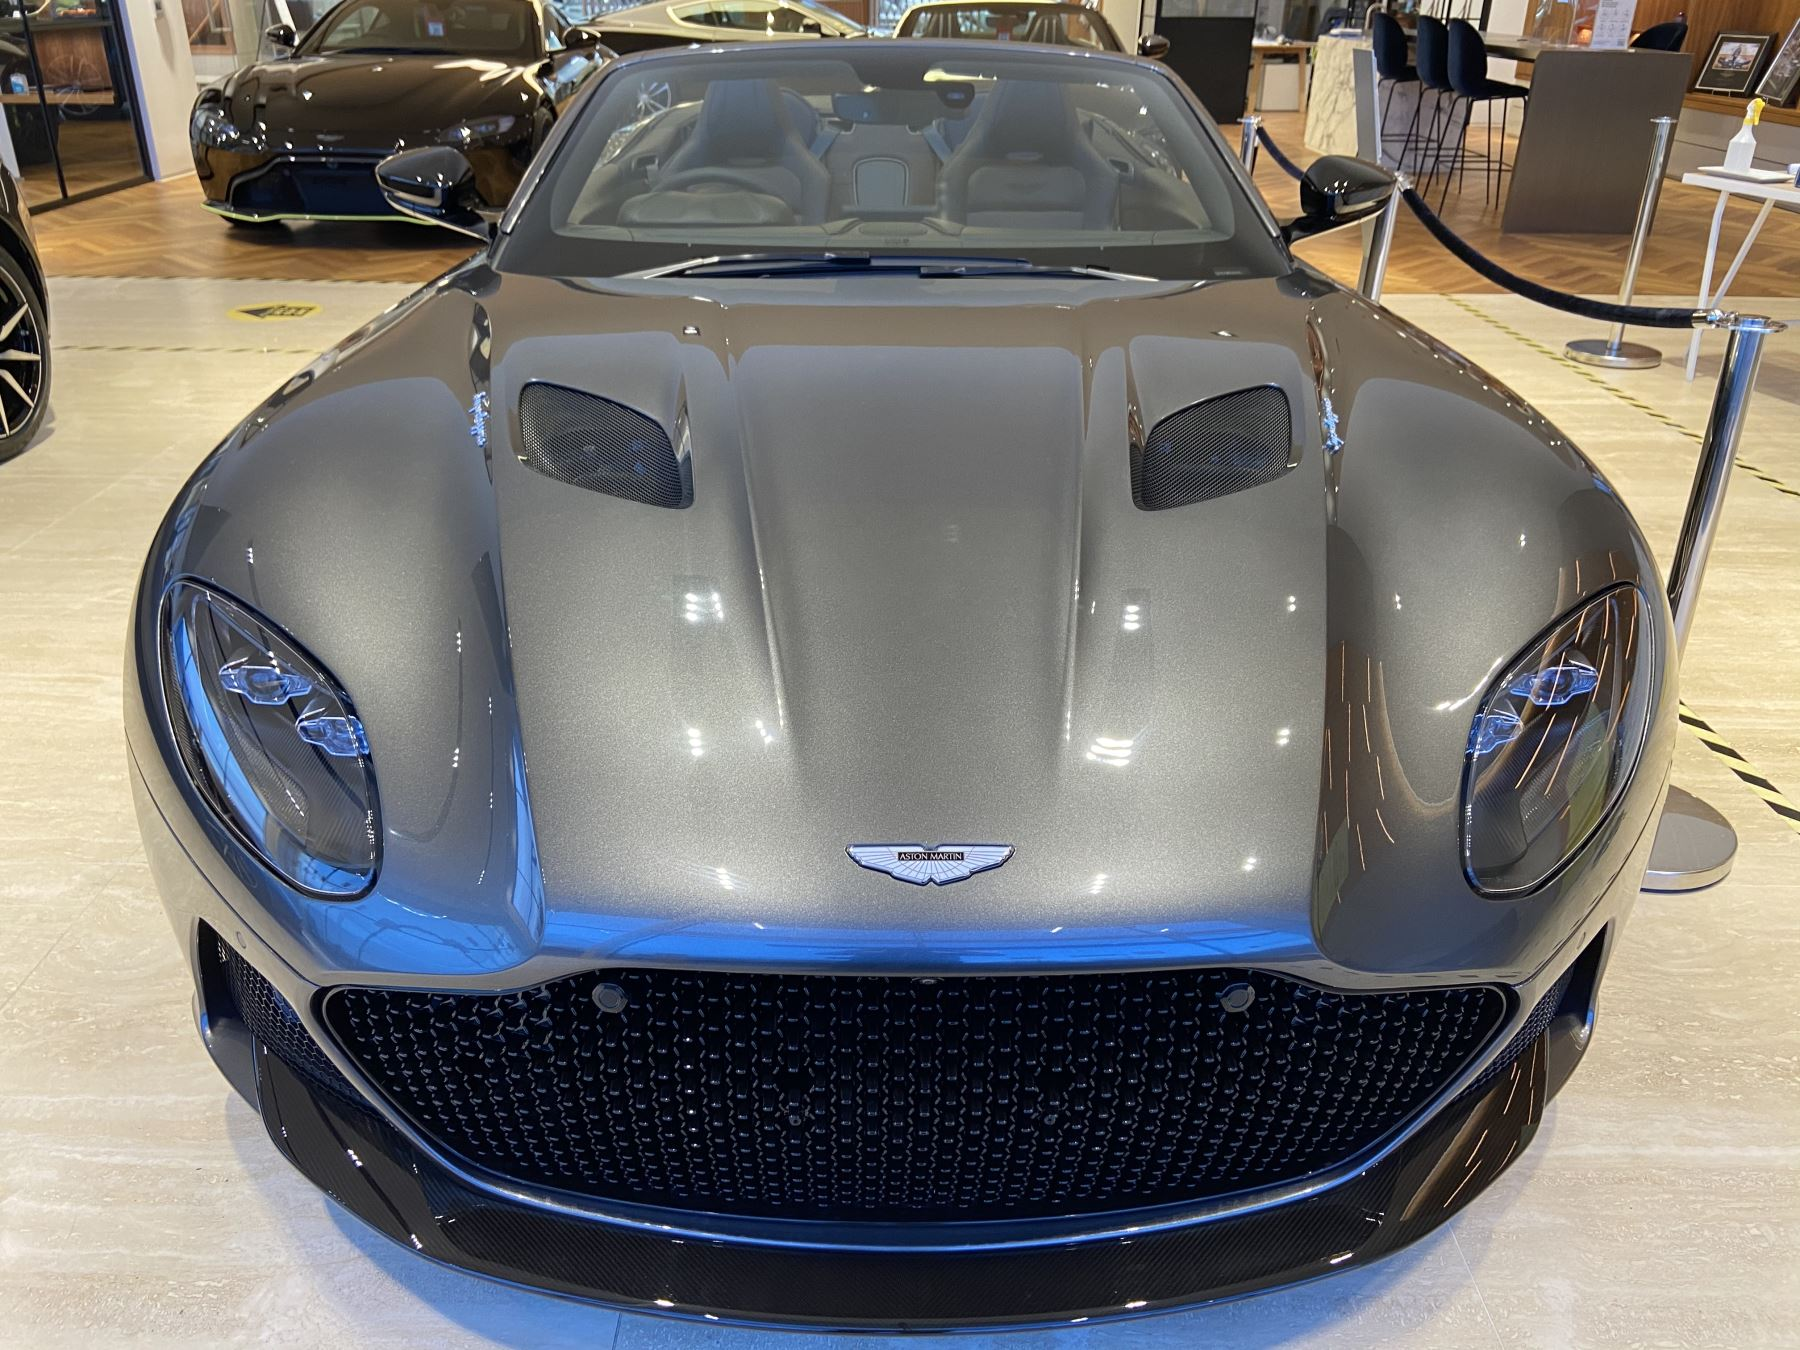 Aston Martin DBS V12 Superleggera Volante Touchtronic image 20